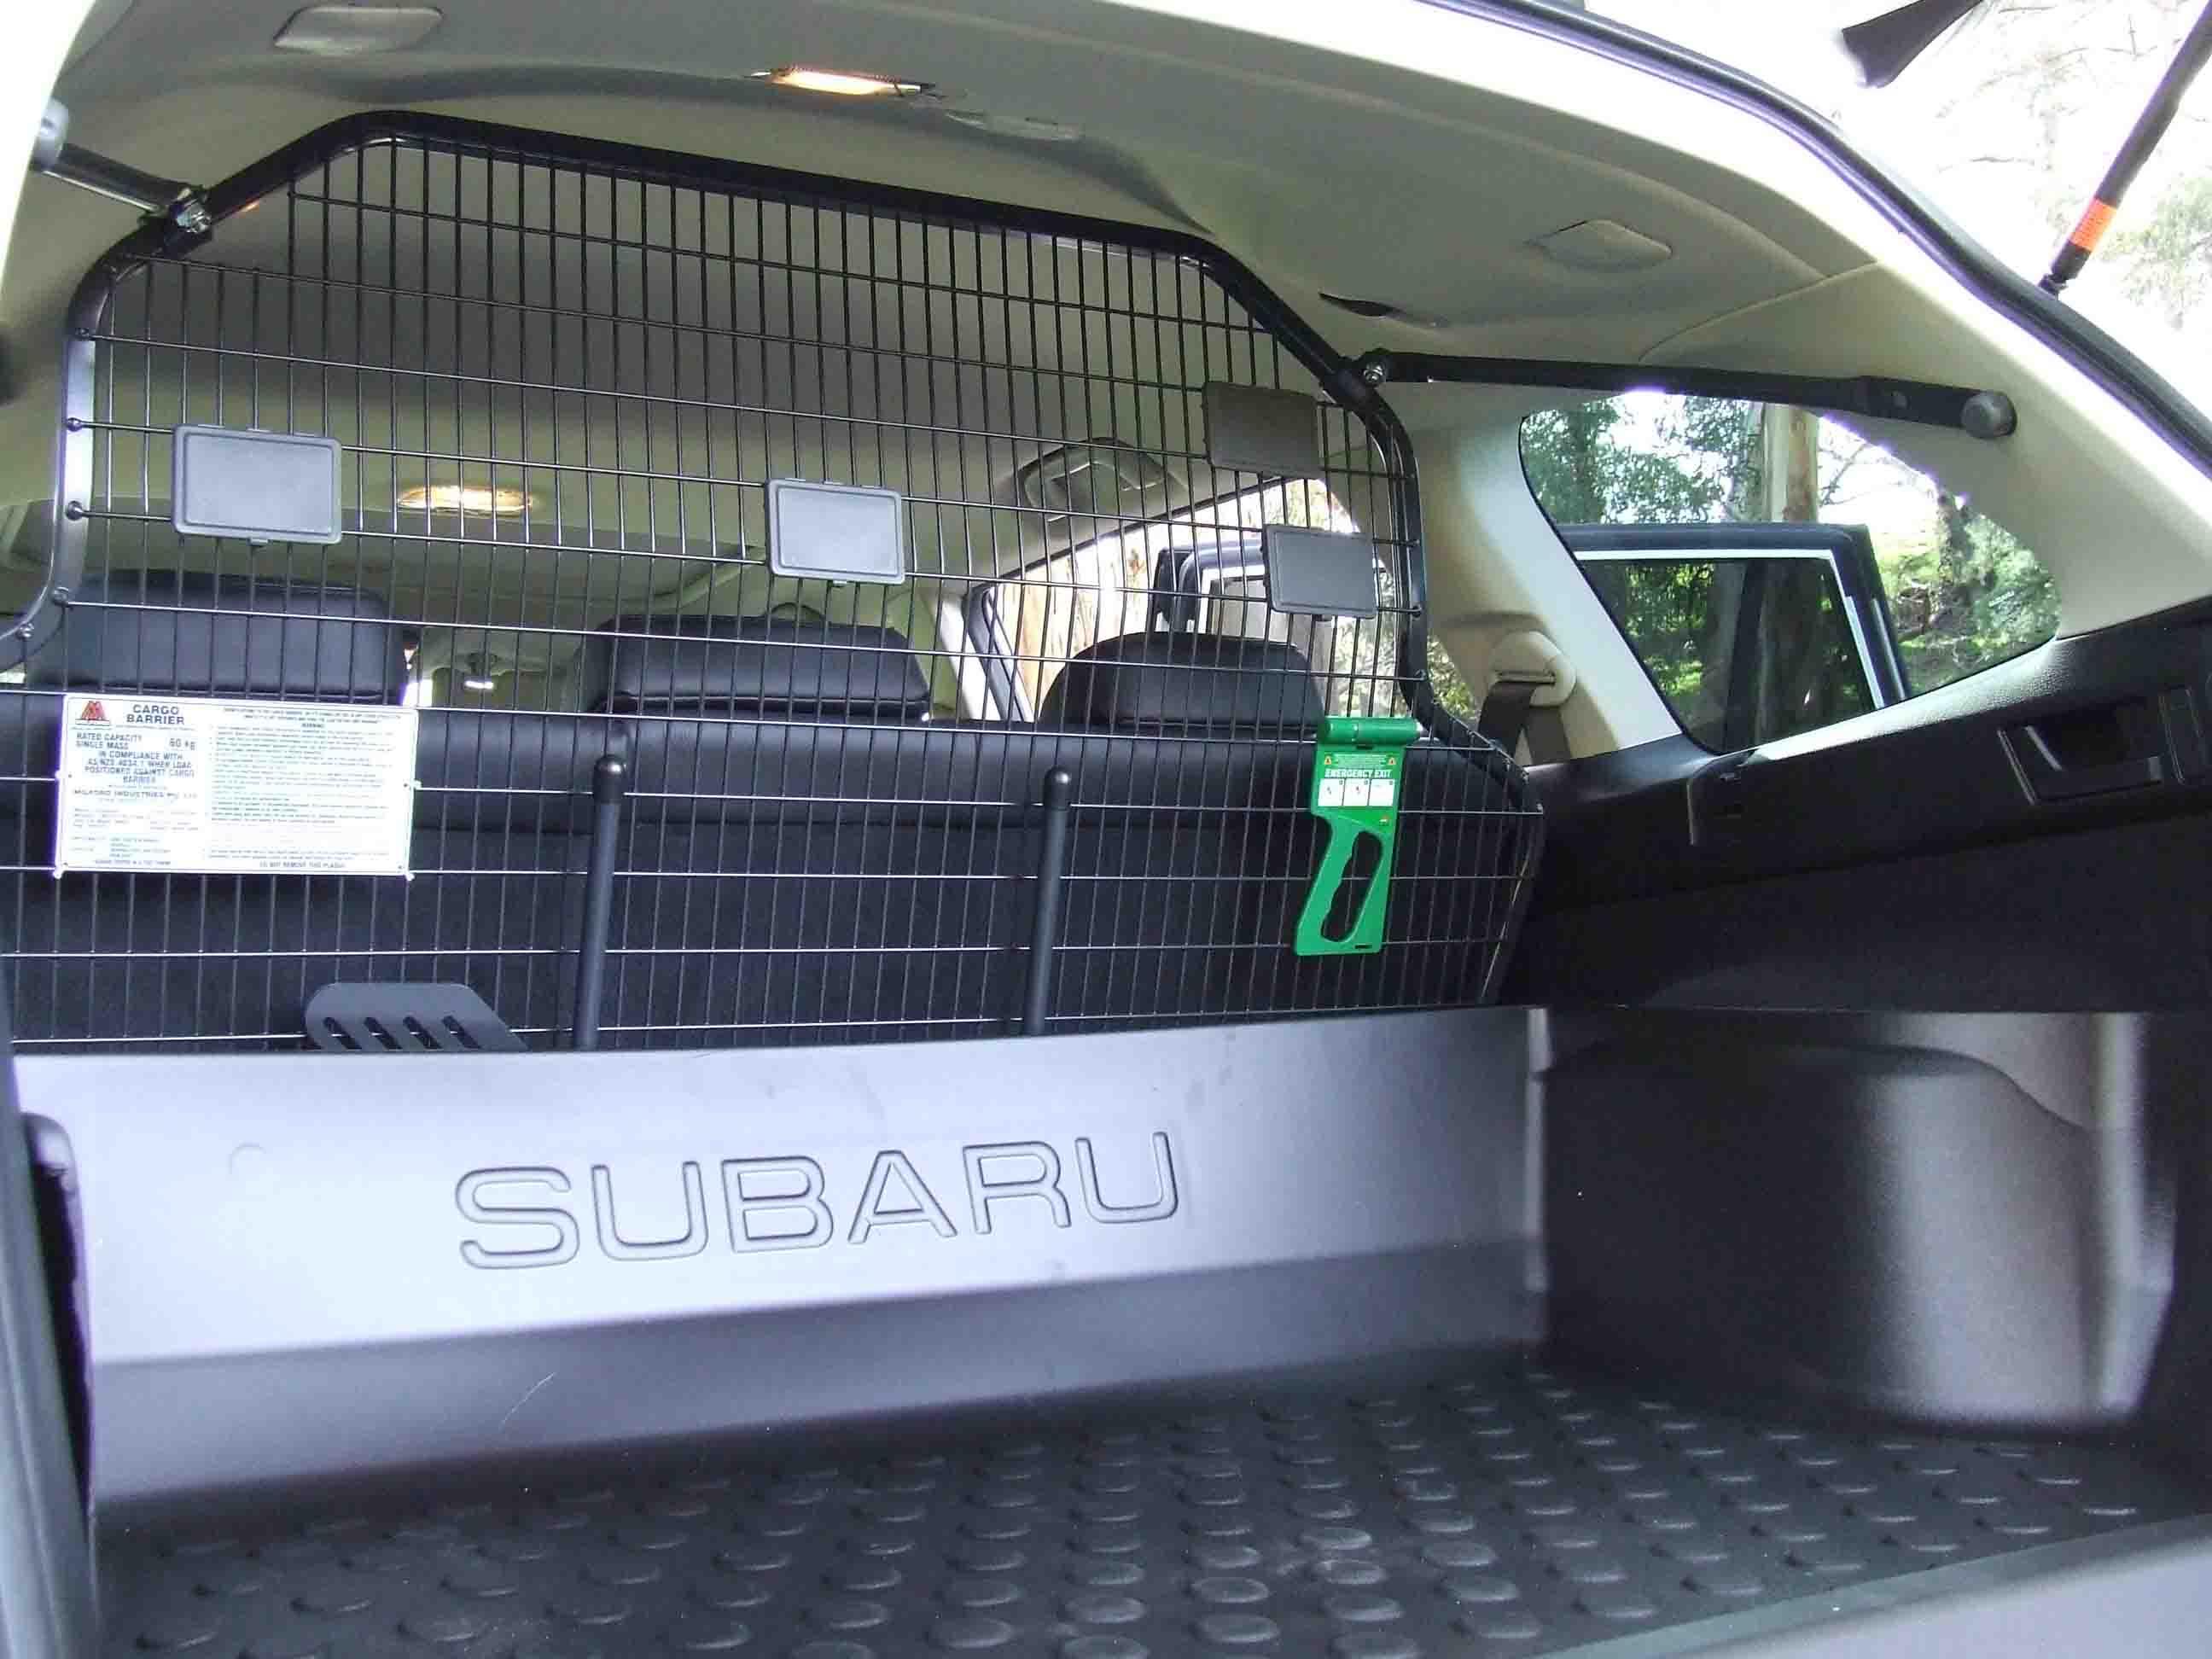 Subaru Pet Barrier - Greatest Subaru